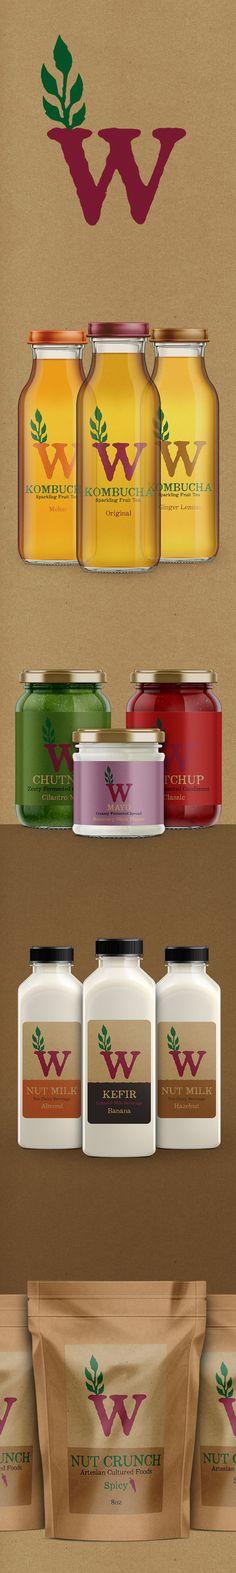 Logo, branding and packaging design for Wild Ferments.